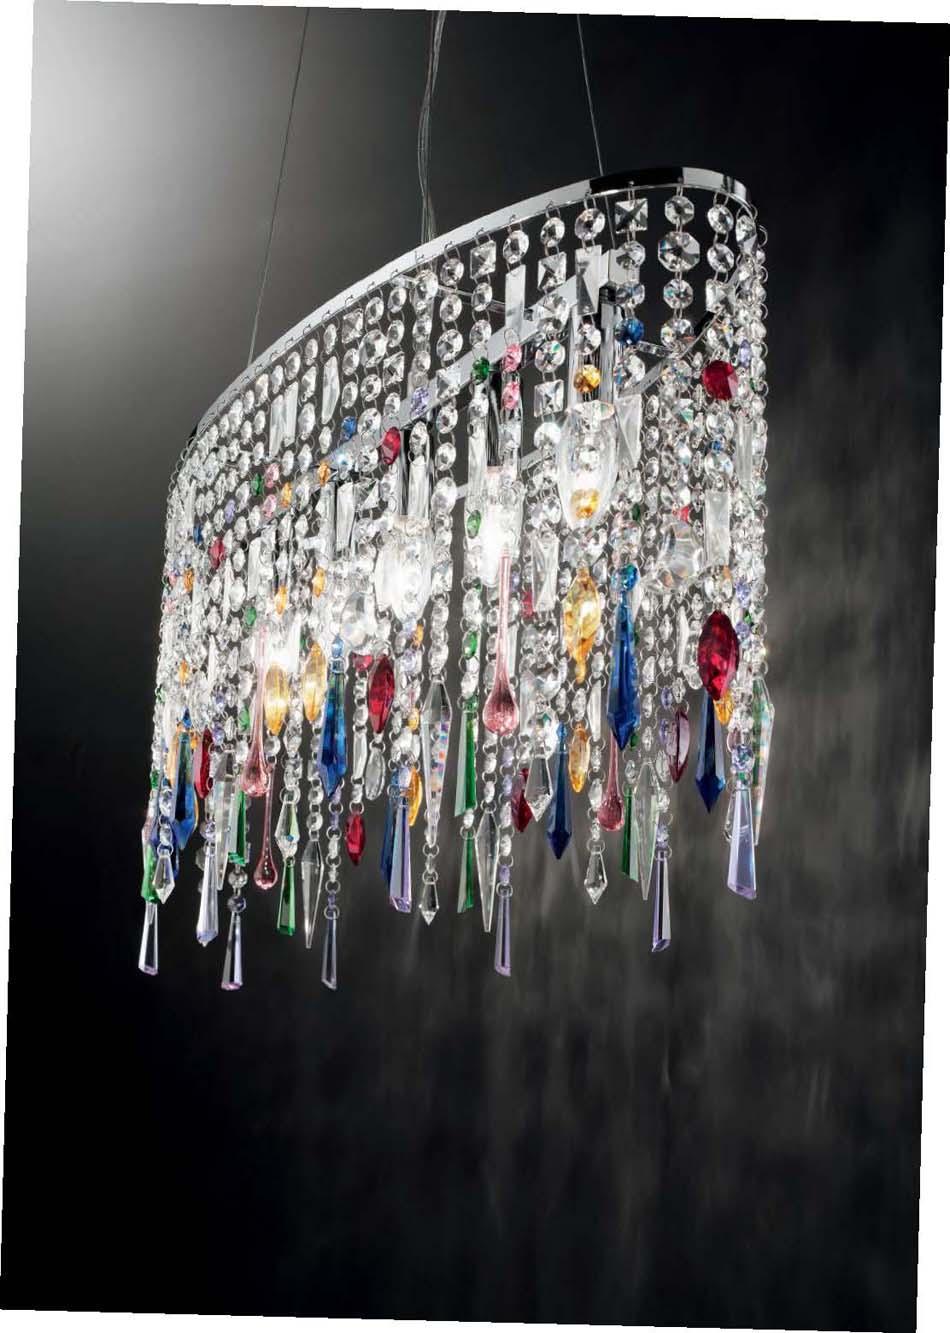 Lampade sospese Ideal Lux Rain Color – Toscana Arredamenti